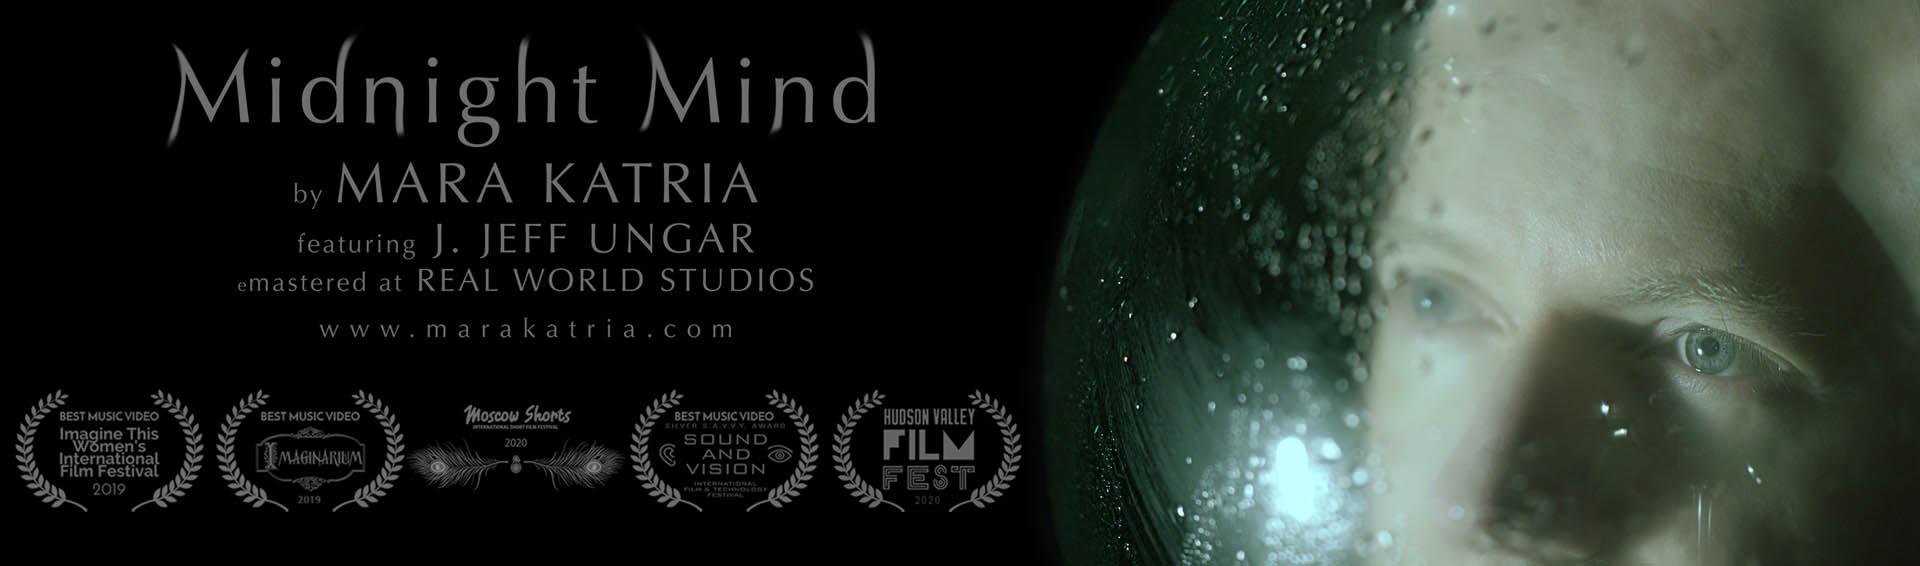 "Midnight Mind by Mara Katria ""Starman"" Banner (J. Jeff Ungar)"